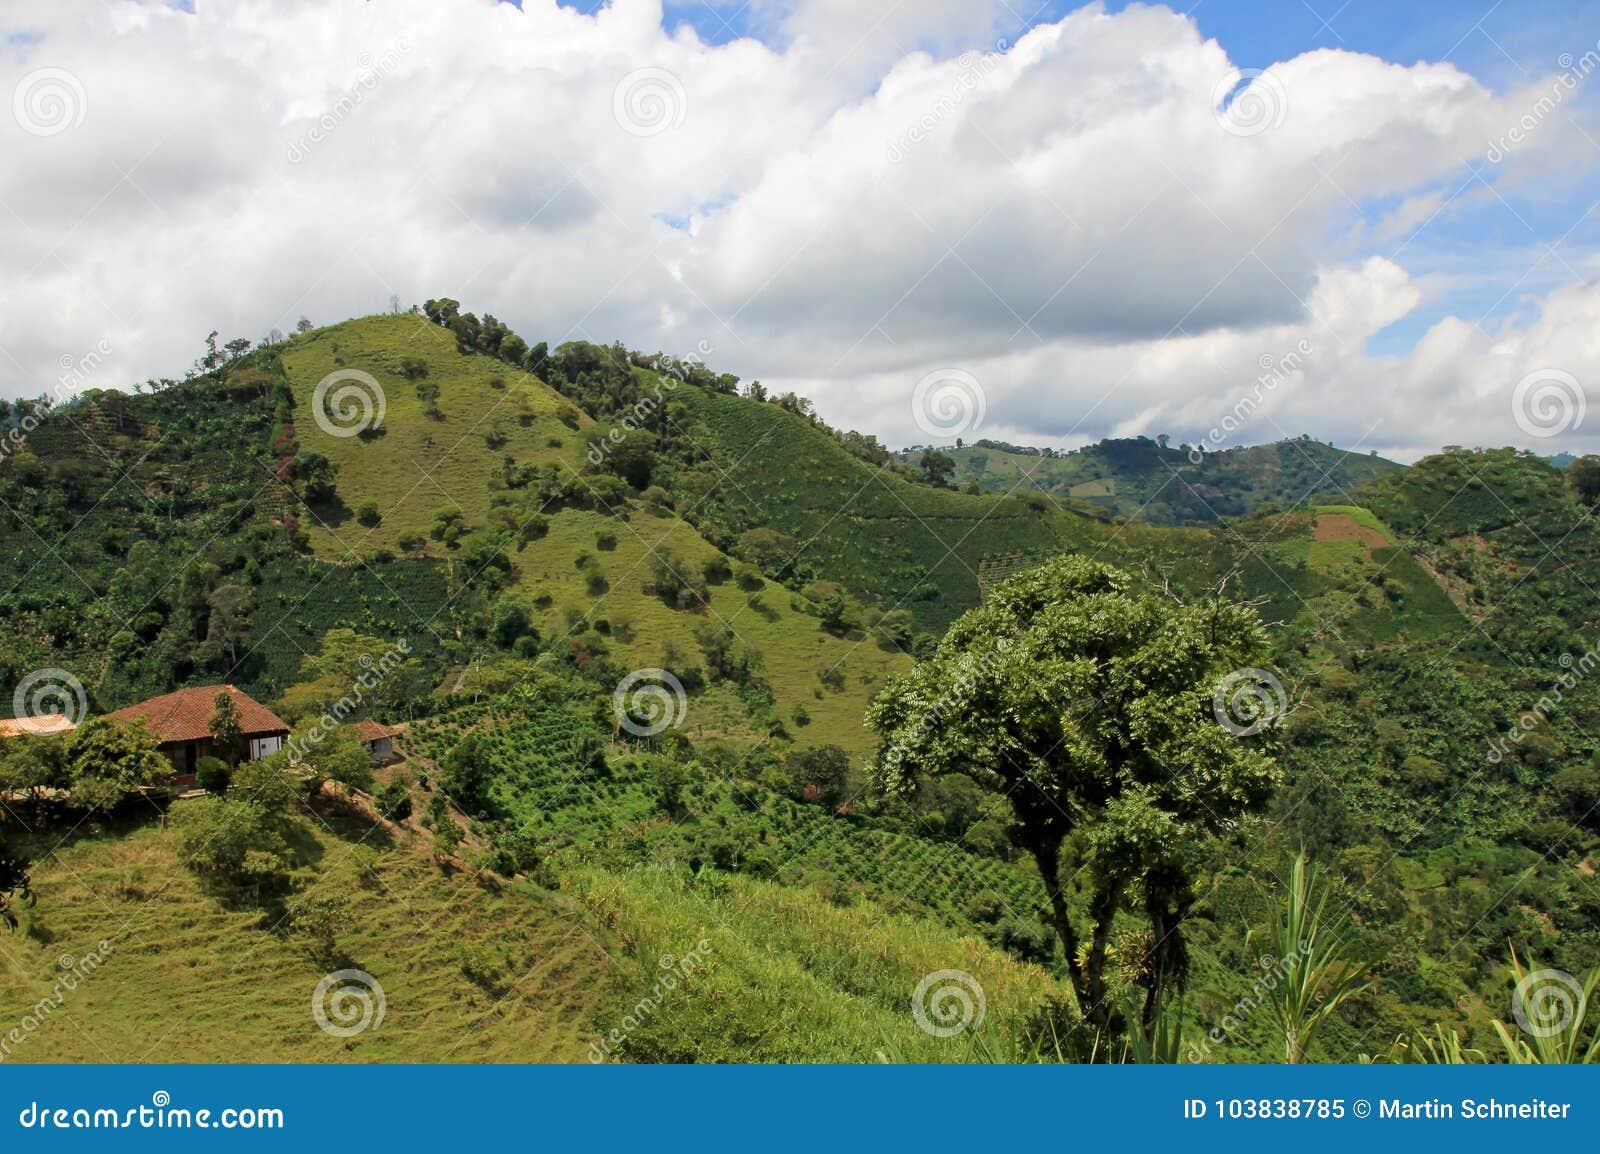 Landscape of coffee and banana plants in the coffee growing region near El Jardin, Antioquia, Colombia